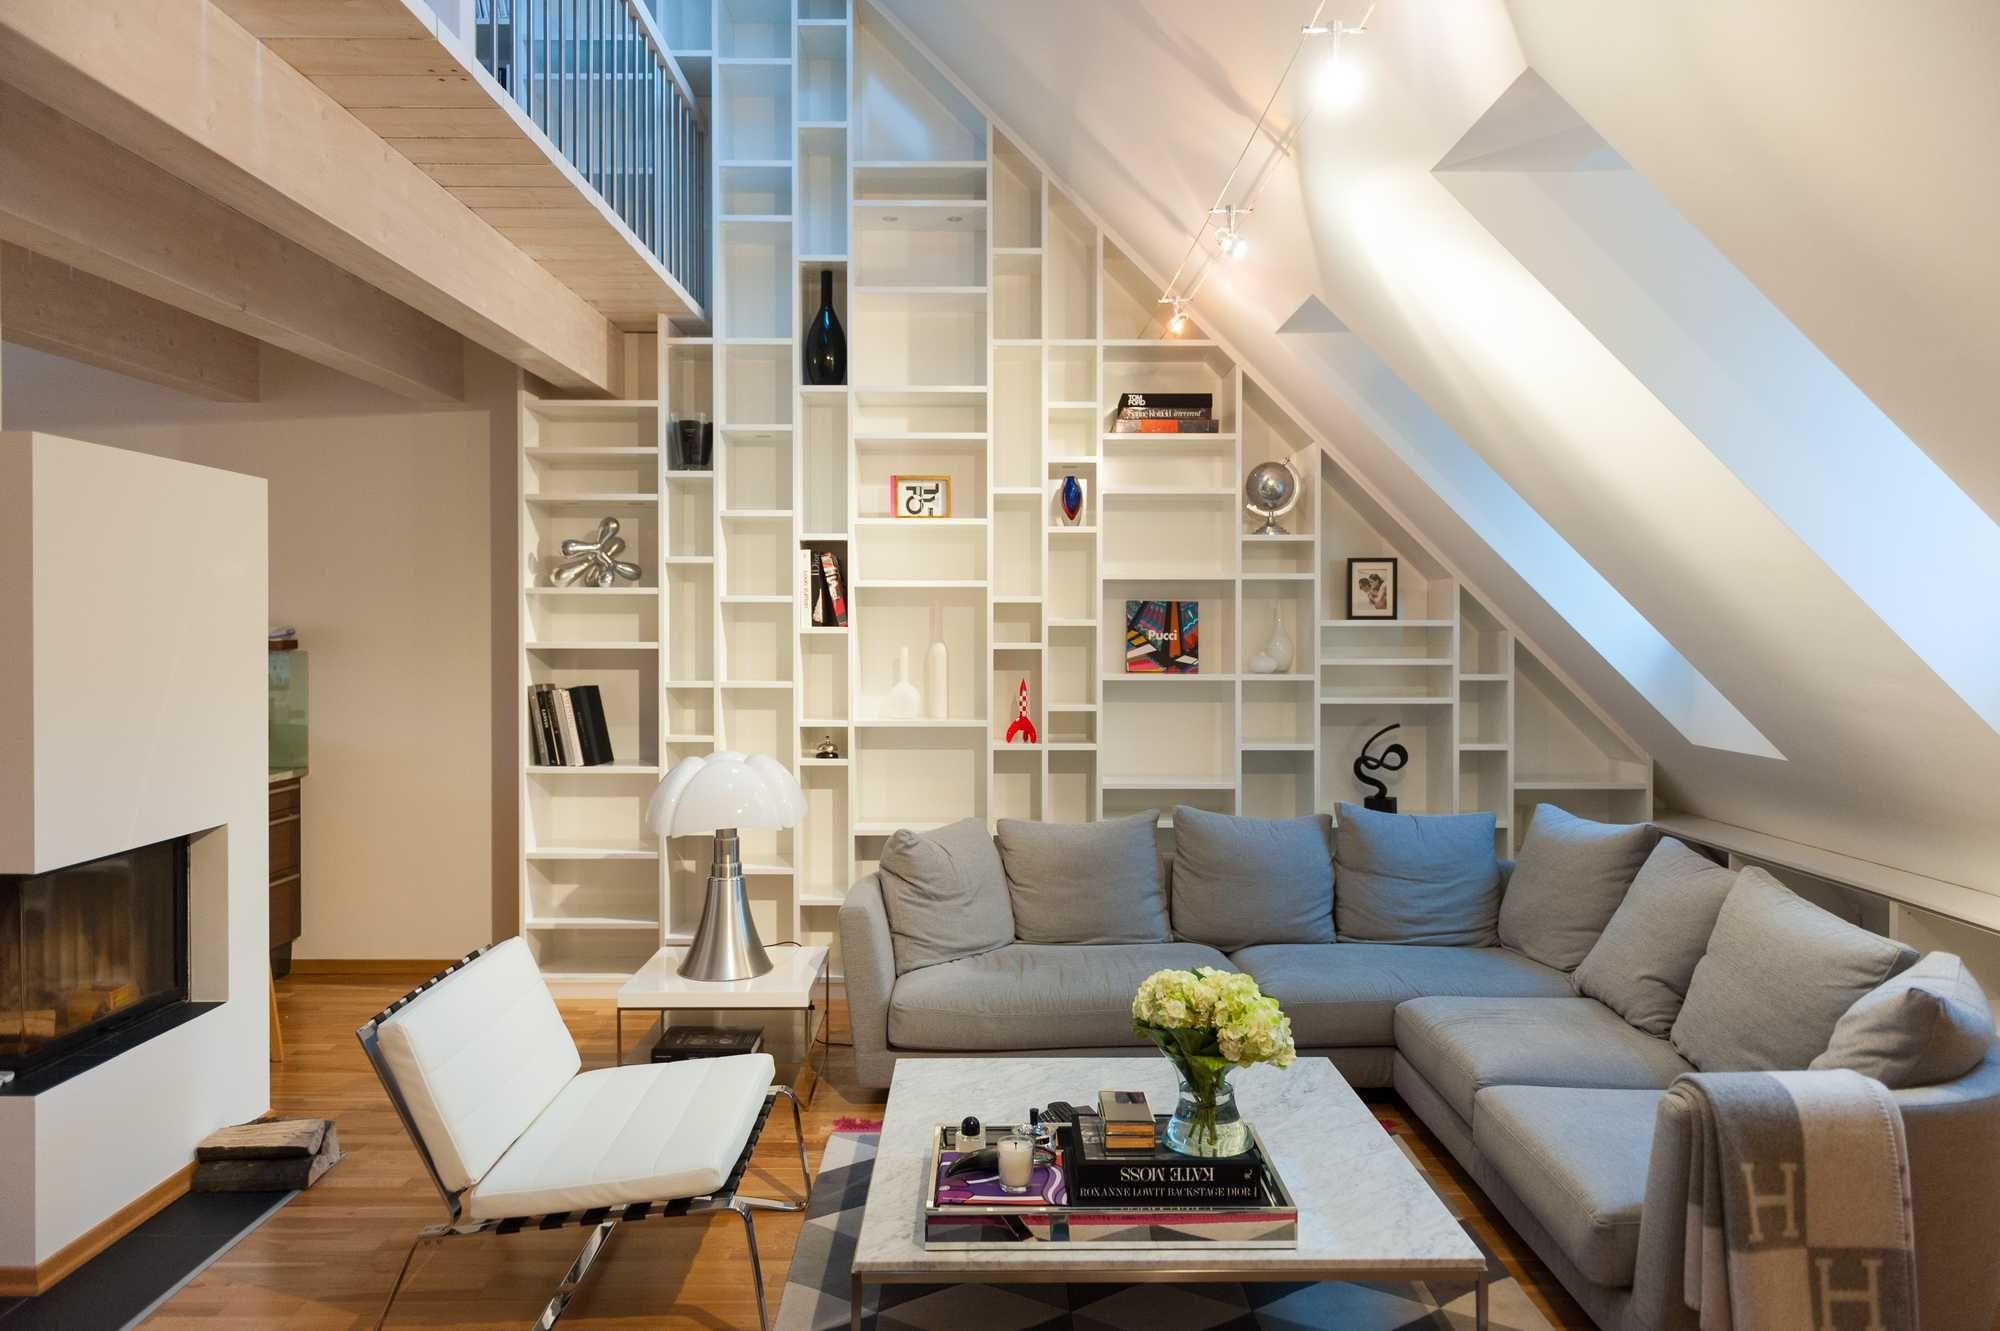 Woonkamer Met Bibliotheek : Bibliotheek woonkamer atelier lenteschoonmaak